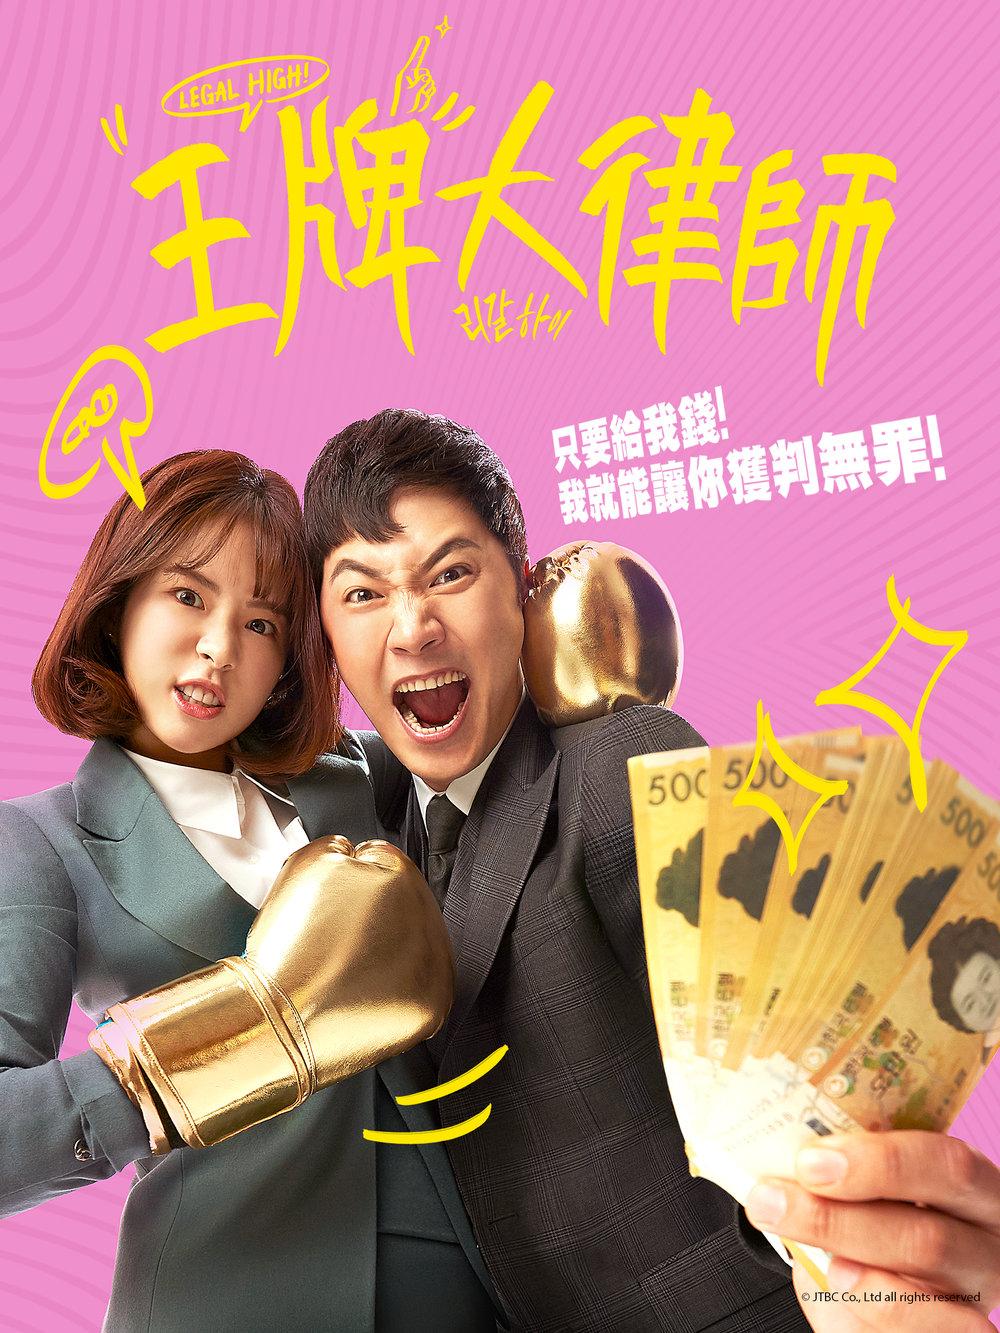 KKTV_smile_16_Legal High 王牌大律師_中文海報_含copyright.jpg